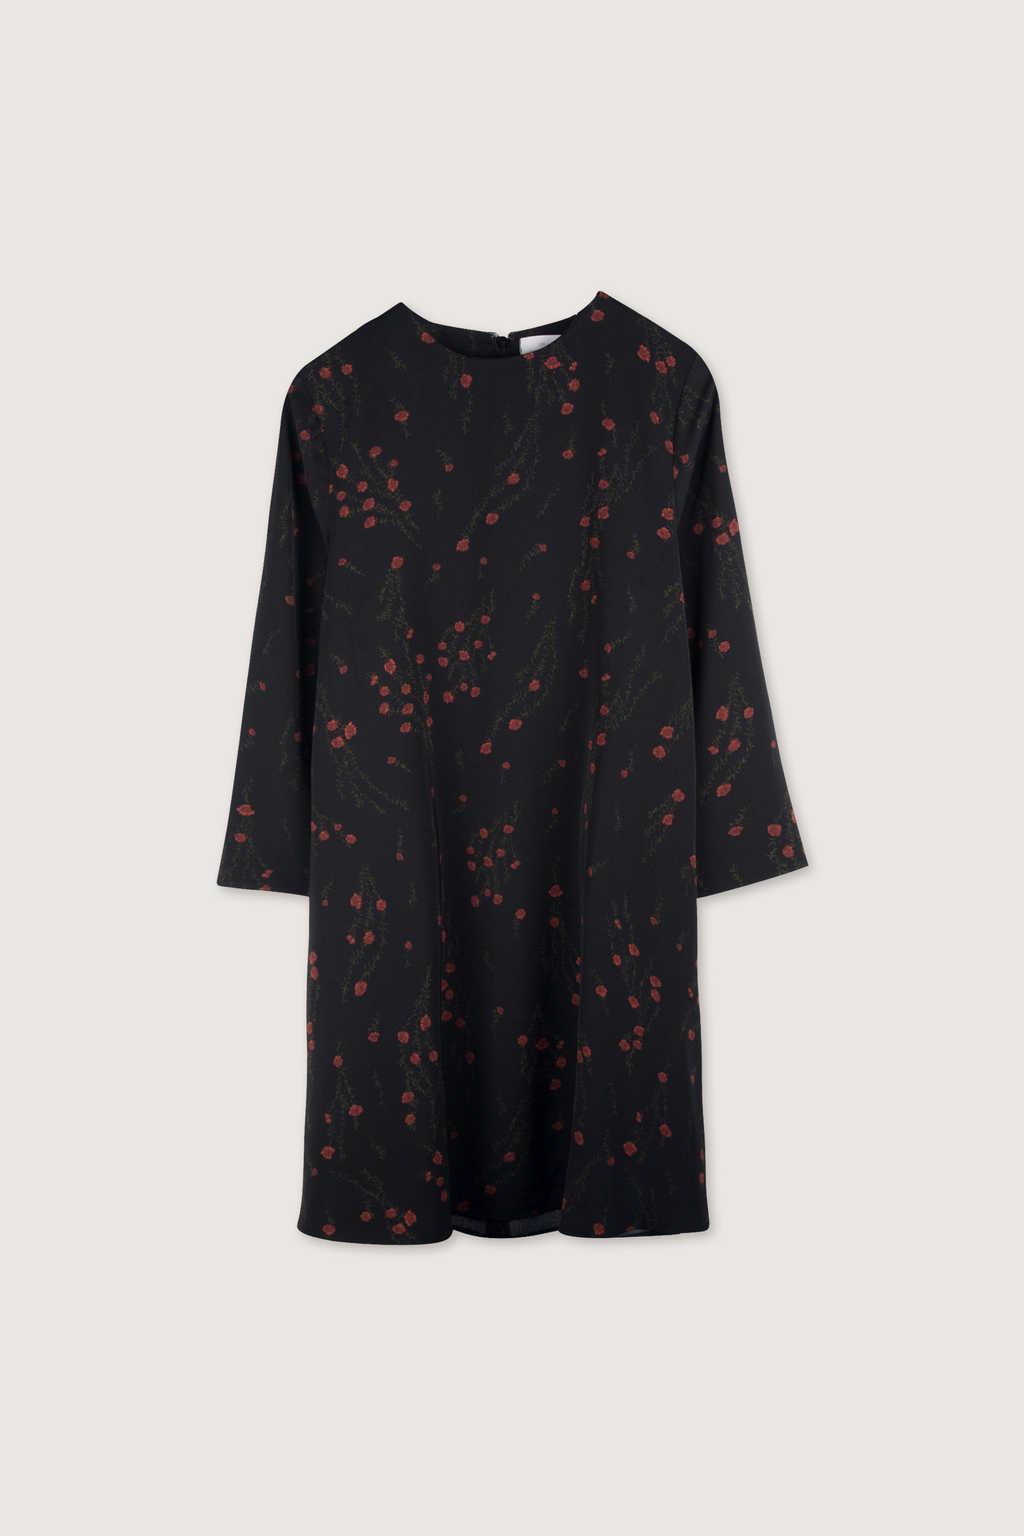 Dress 1649 Print 5